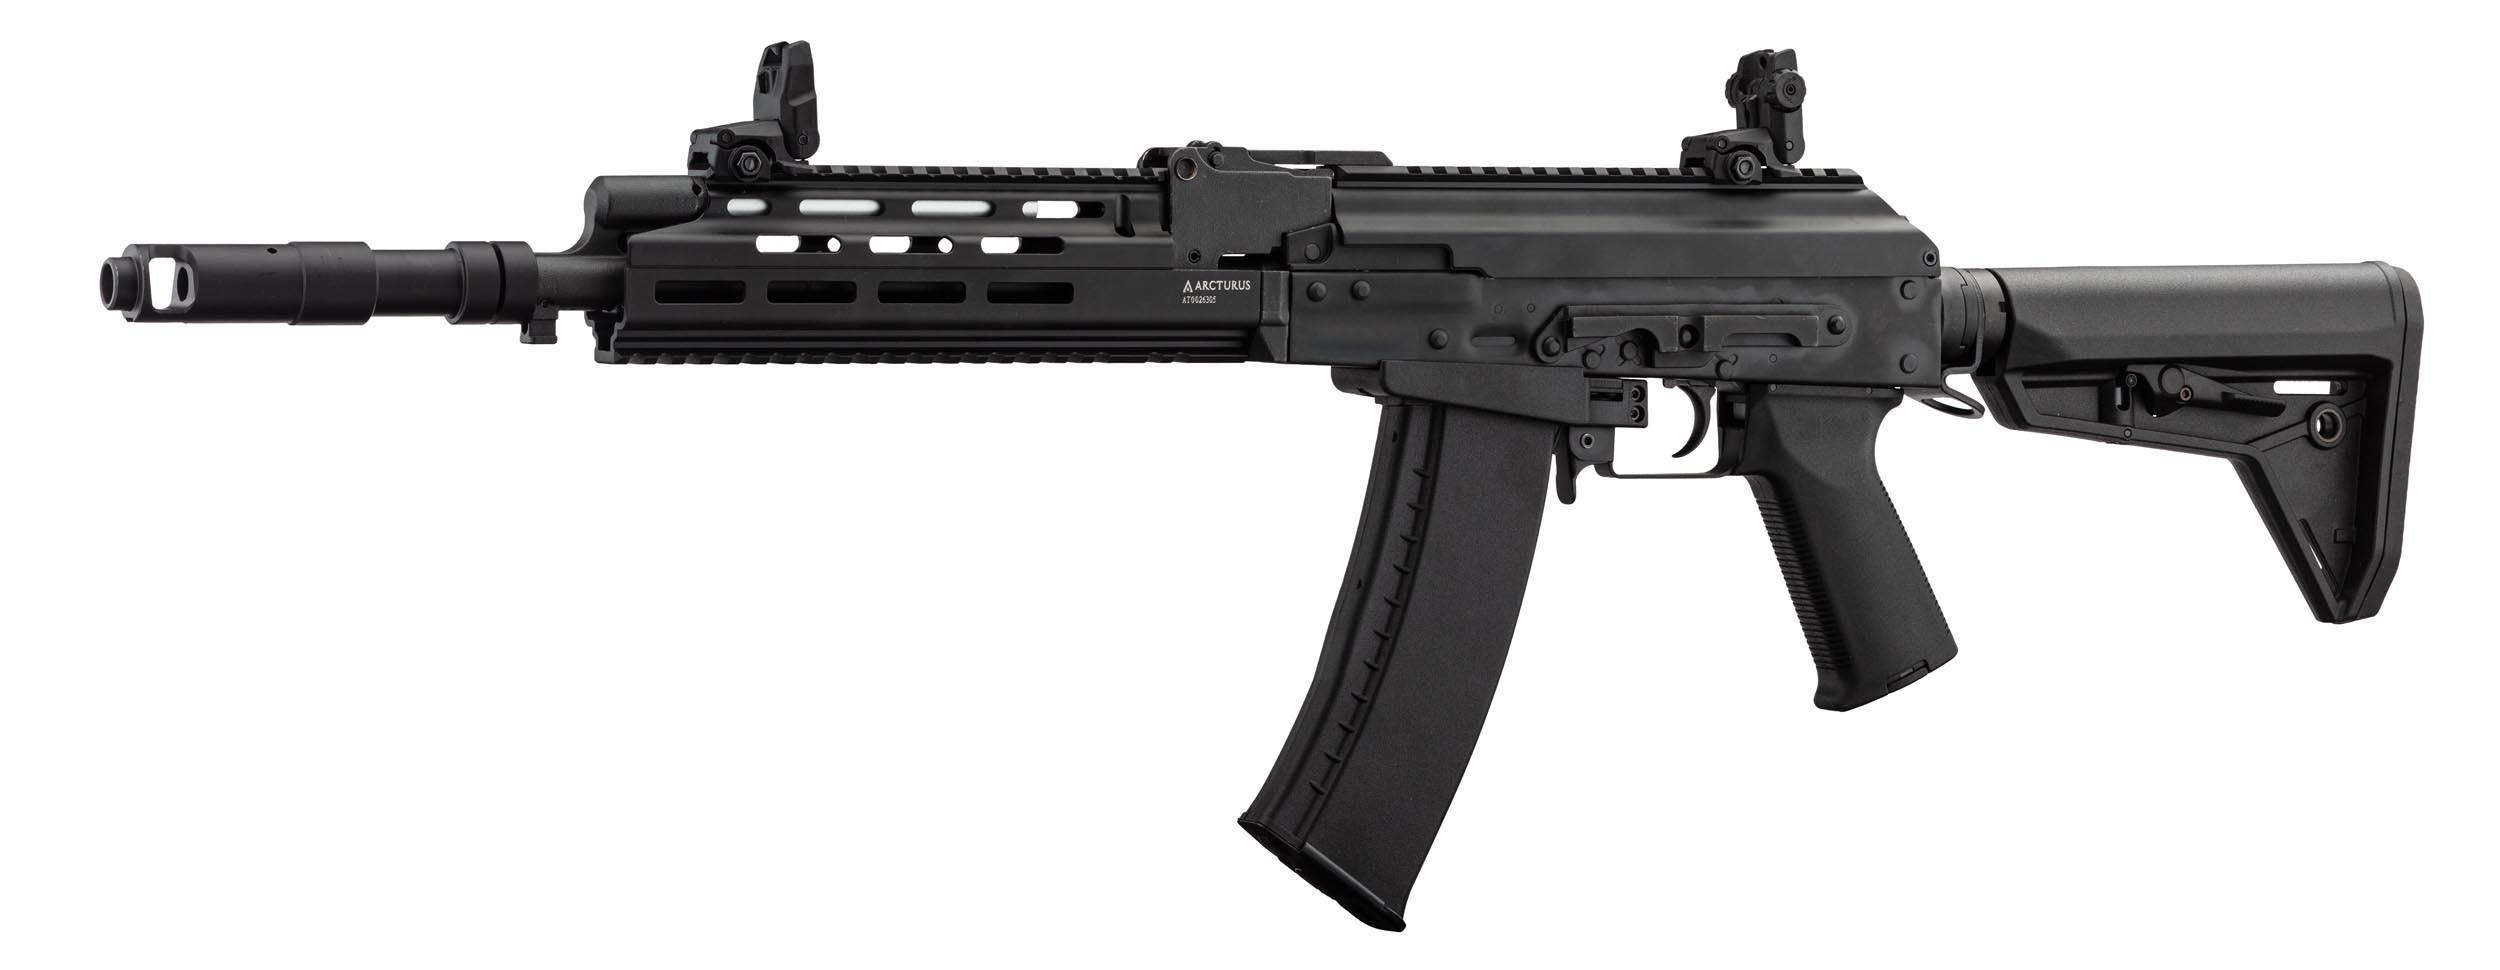 Arcturus - Carabine AK74 Custom AEG - Noire (1 Joule)